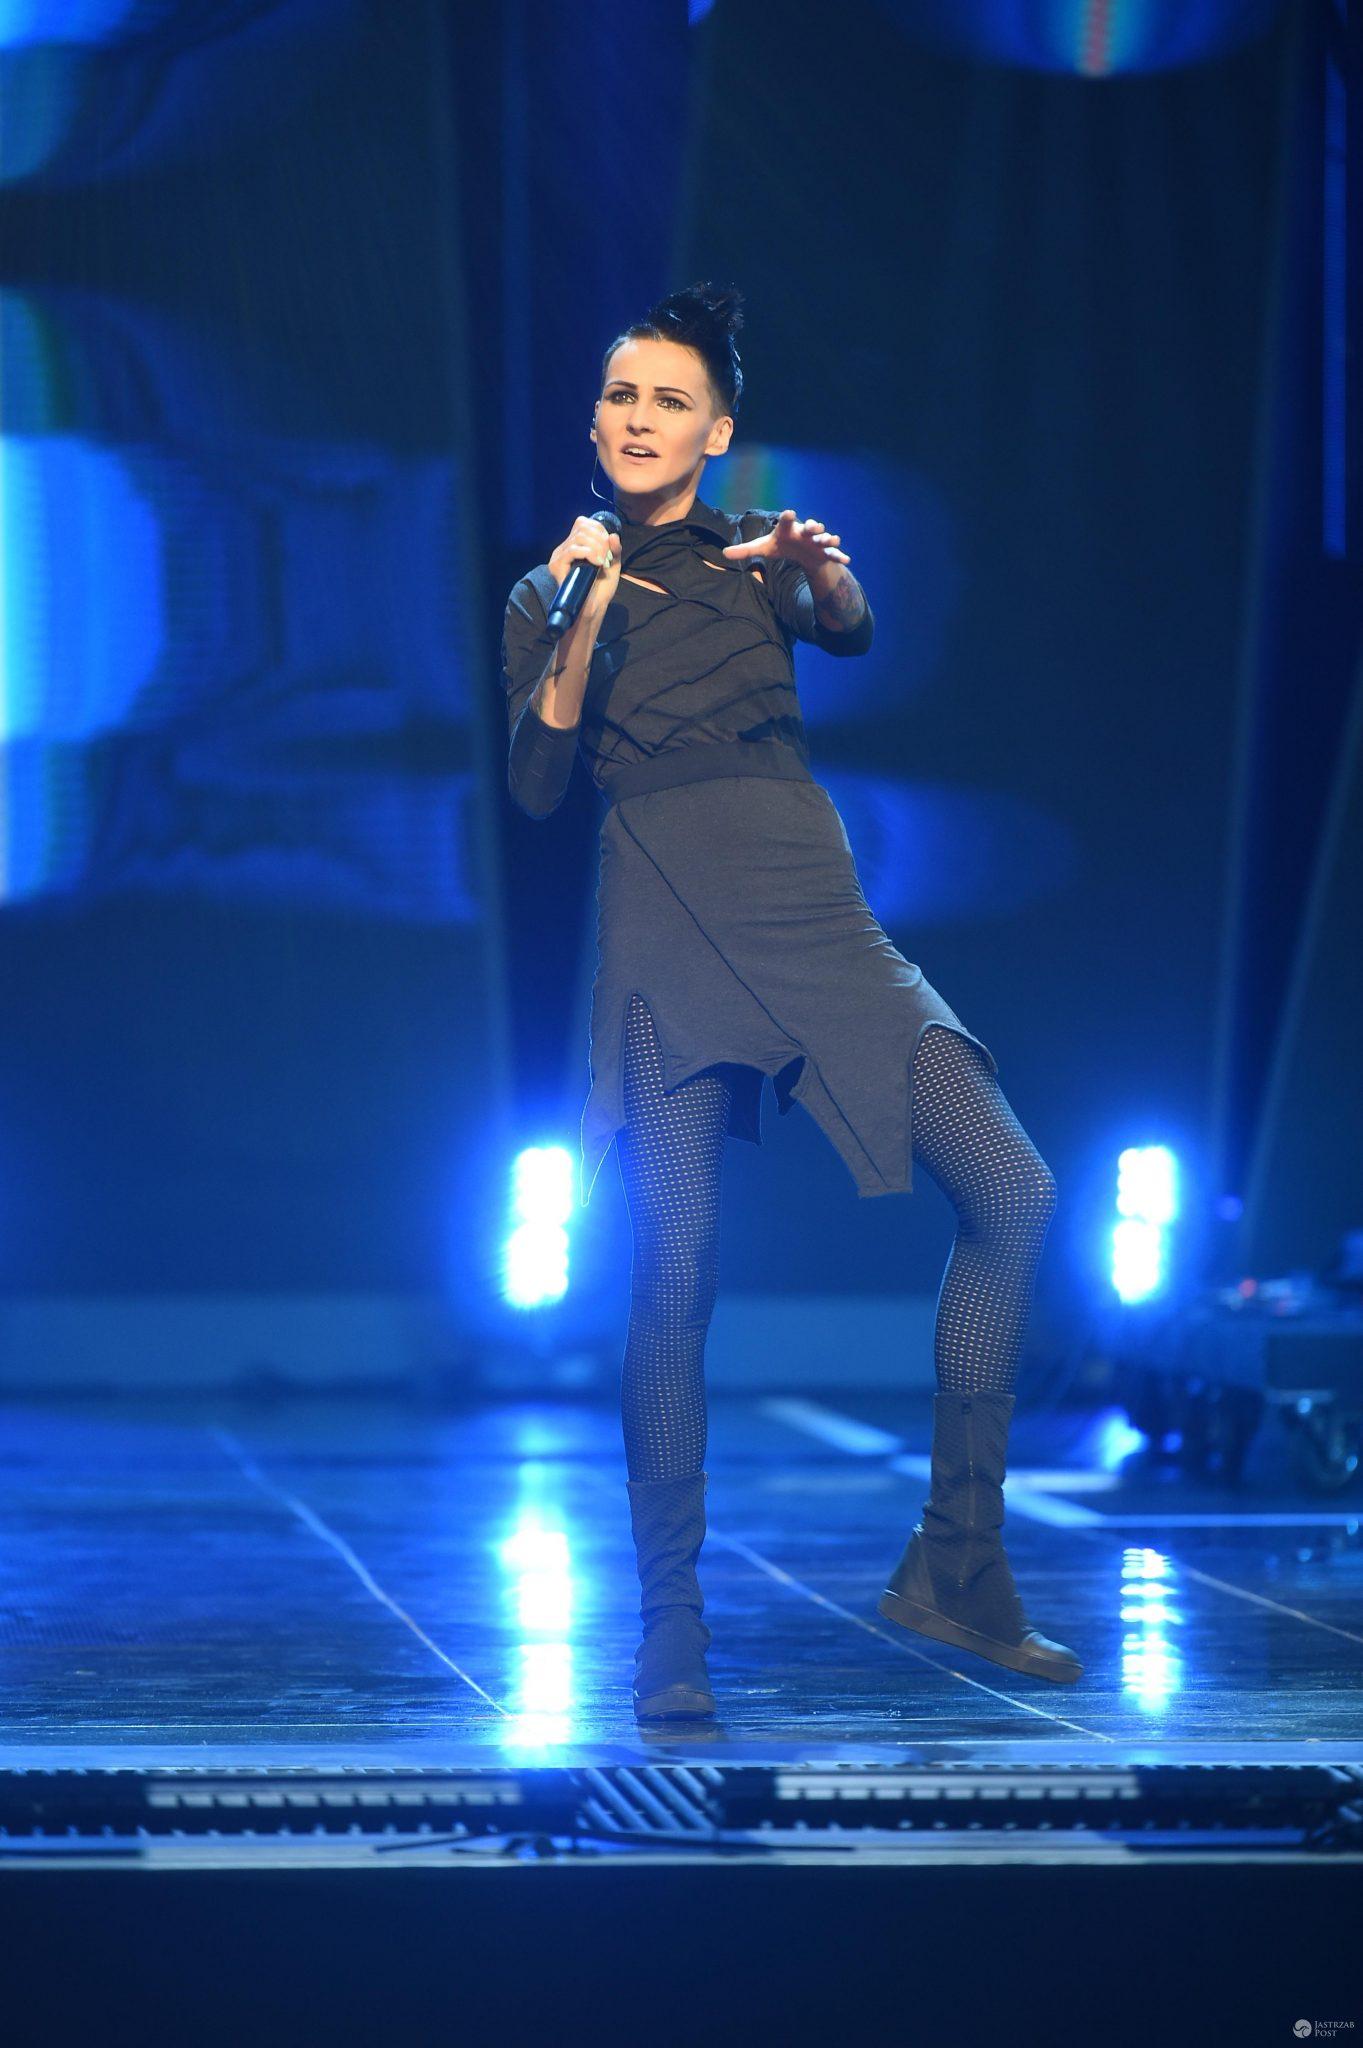 Agnieszka Chylińska - Polsat Superhit Festiwal 2017